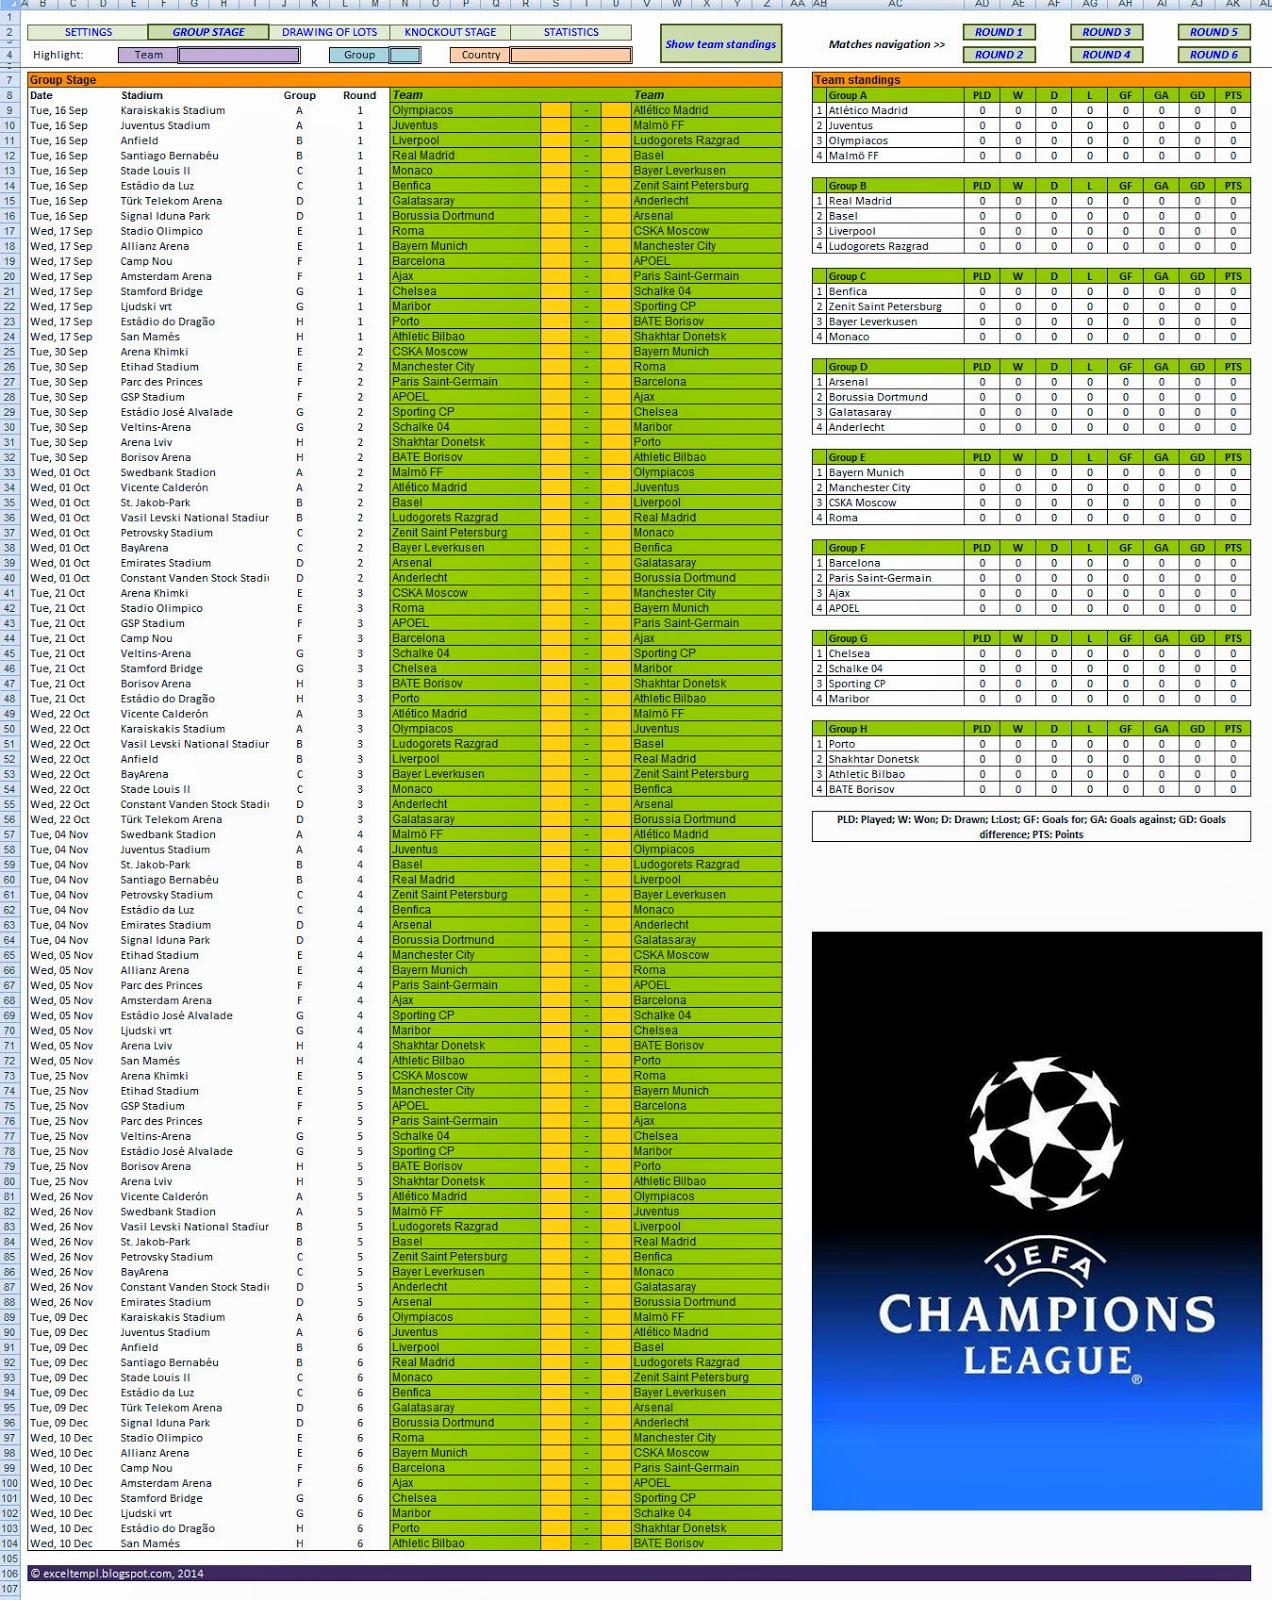 excel templates 2014 15 uefa champions league schedule spreadsheet